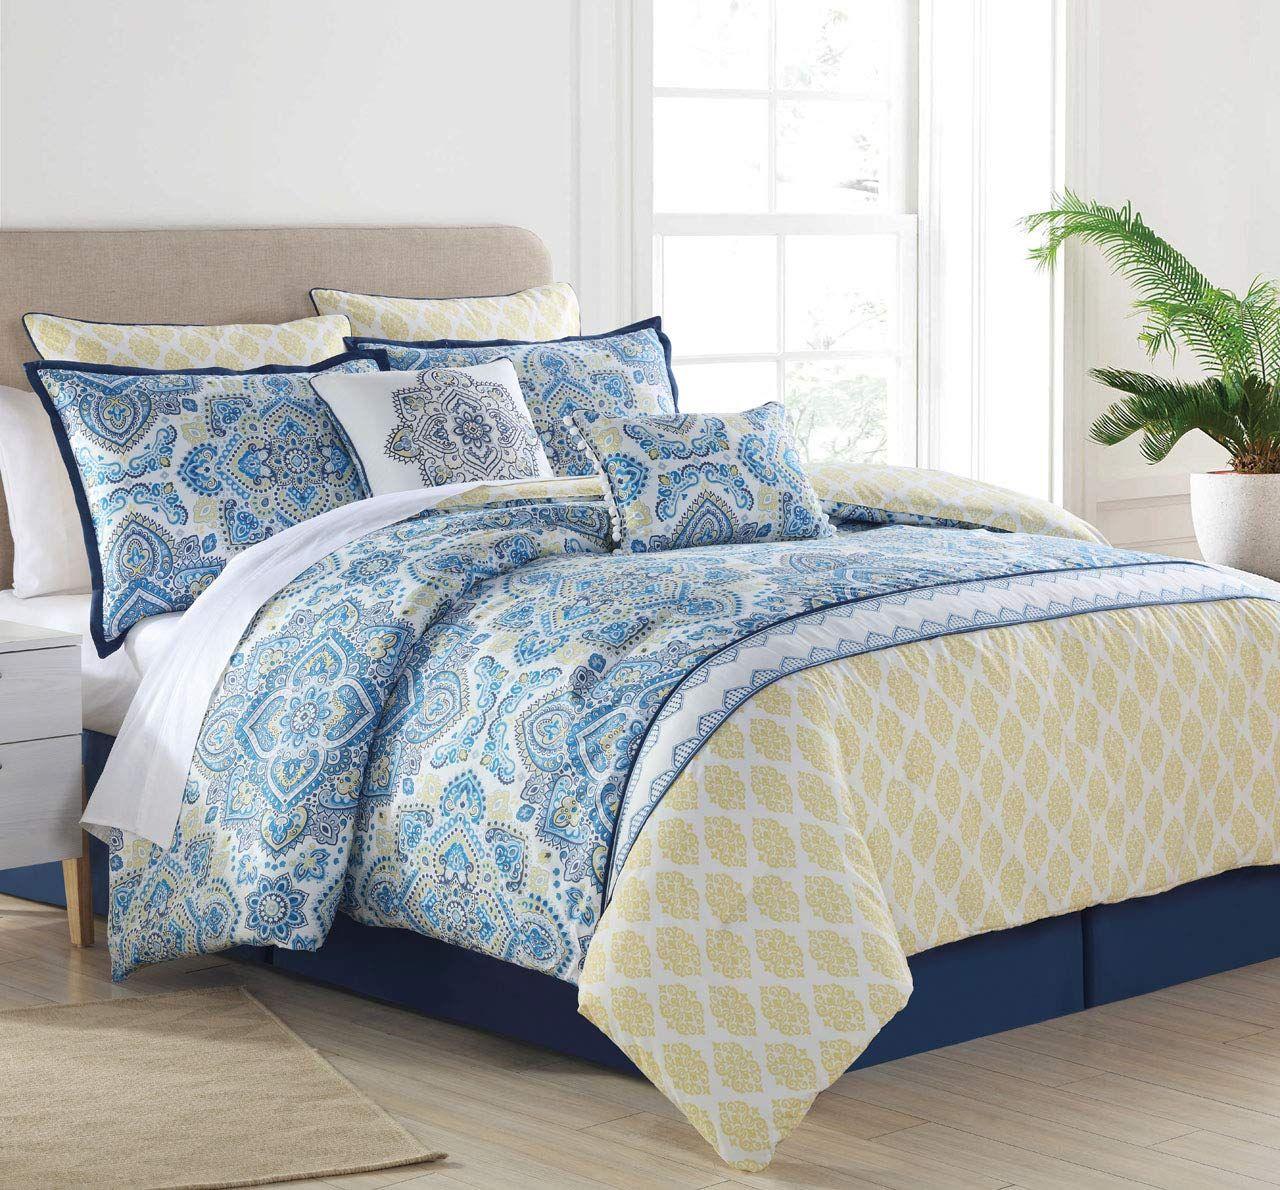 8 Piece Sasha Blue Yellow Comforter Set King You Can Get